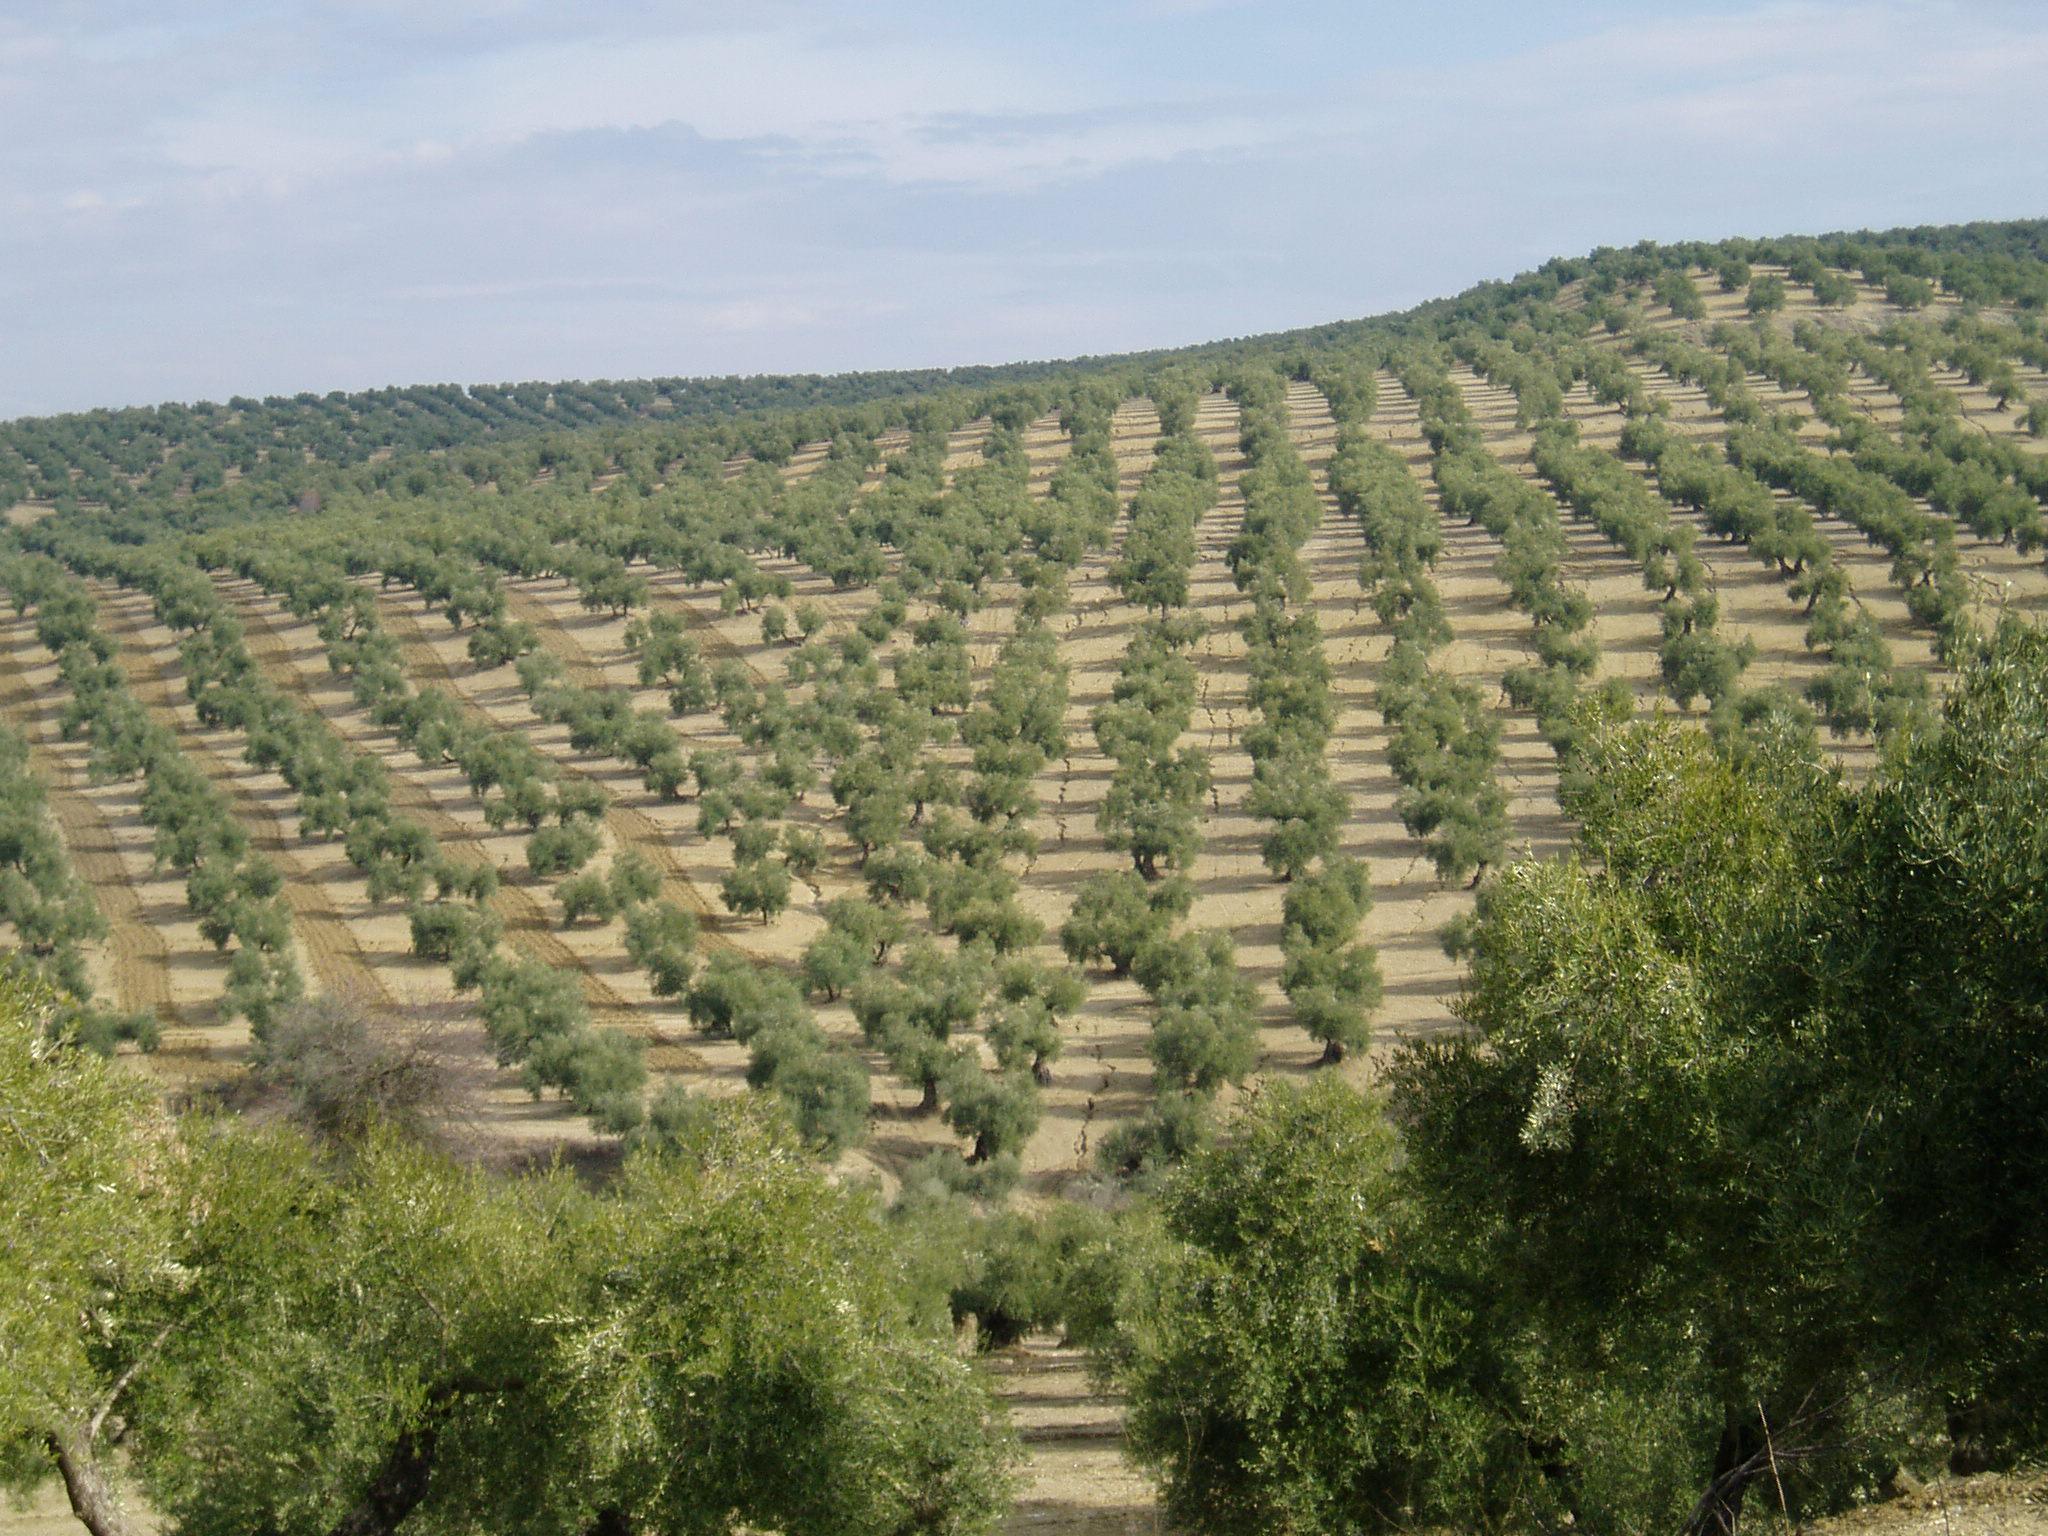 Spanish olive grove